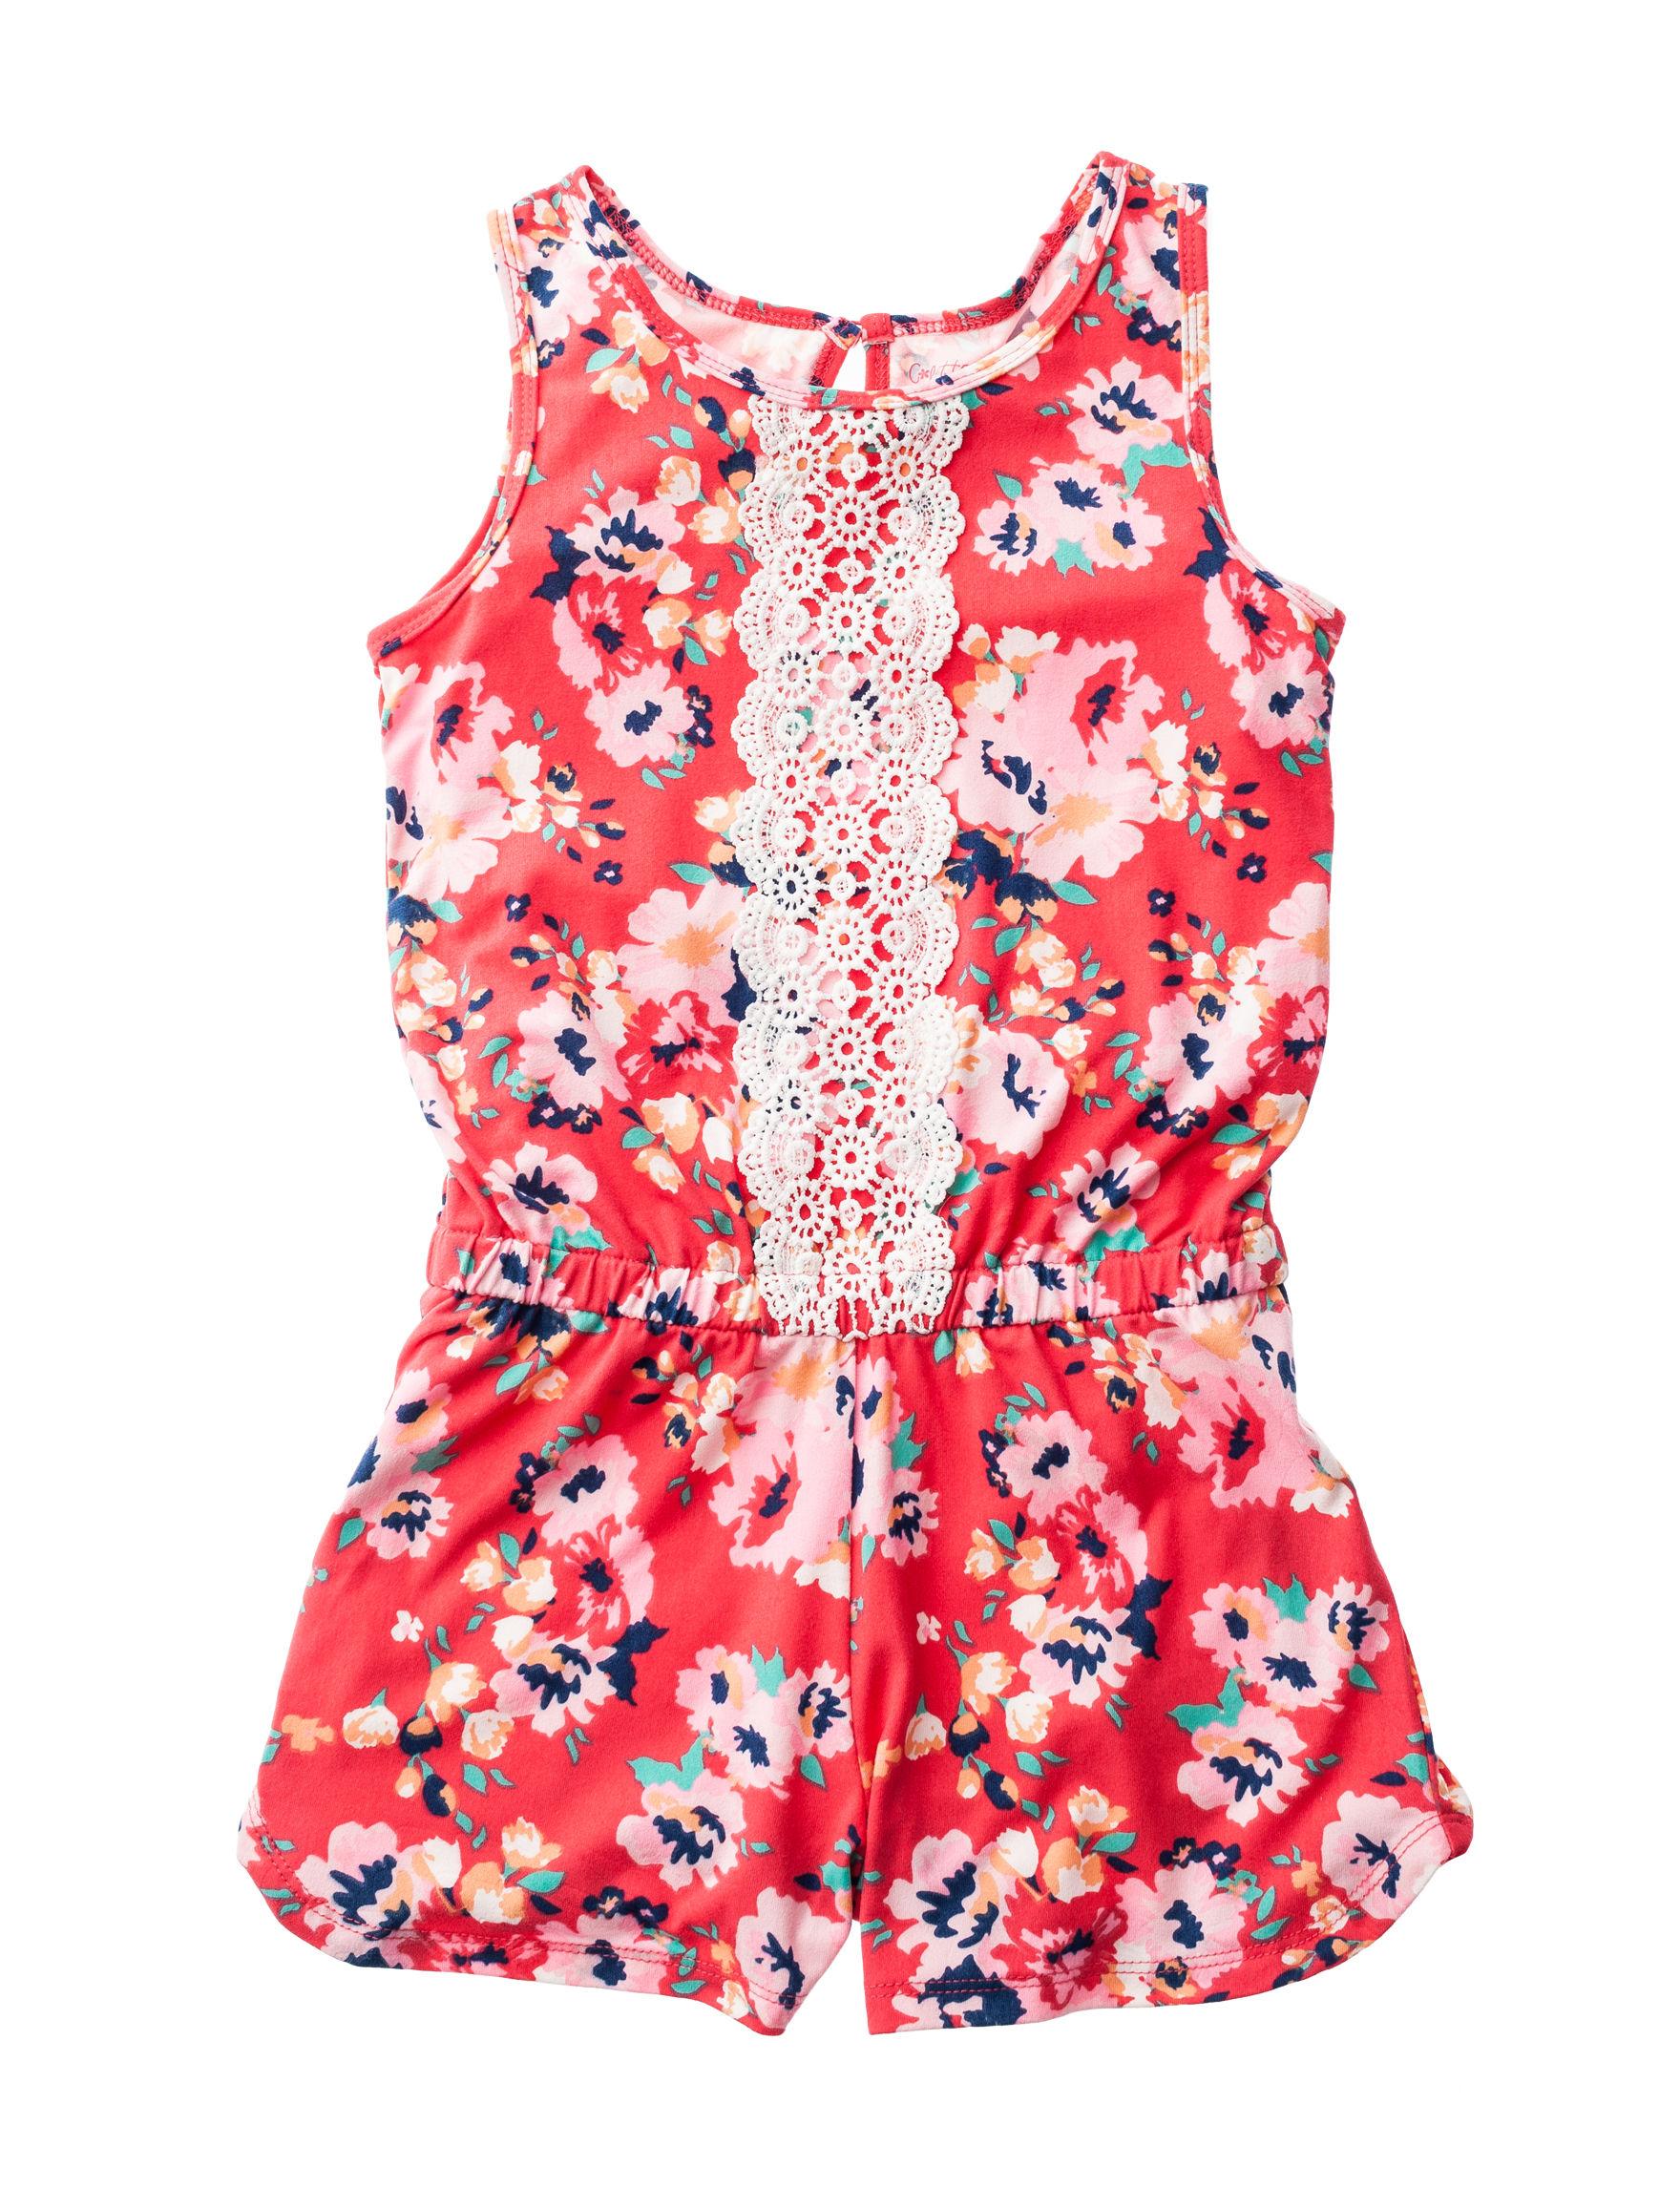 Colette Lily Pink Floral